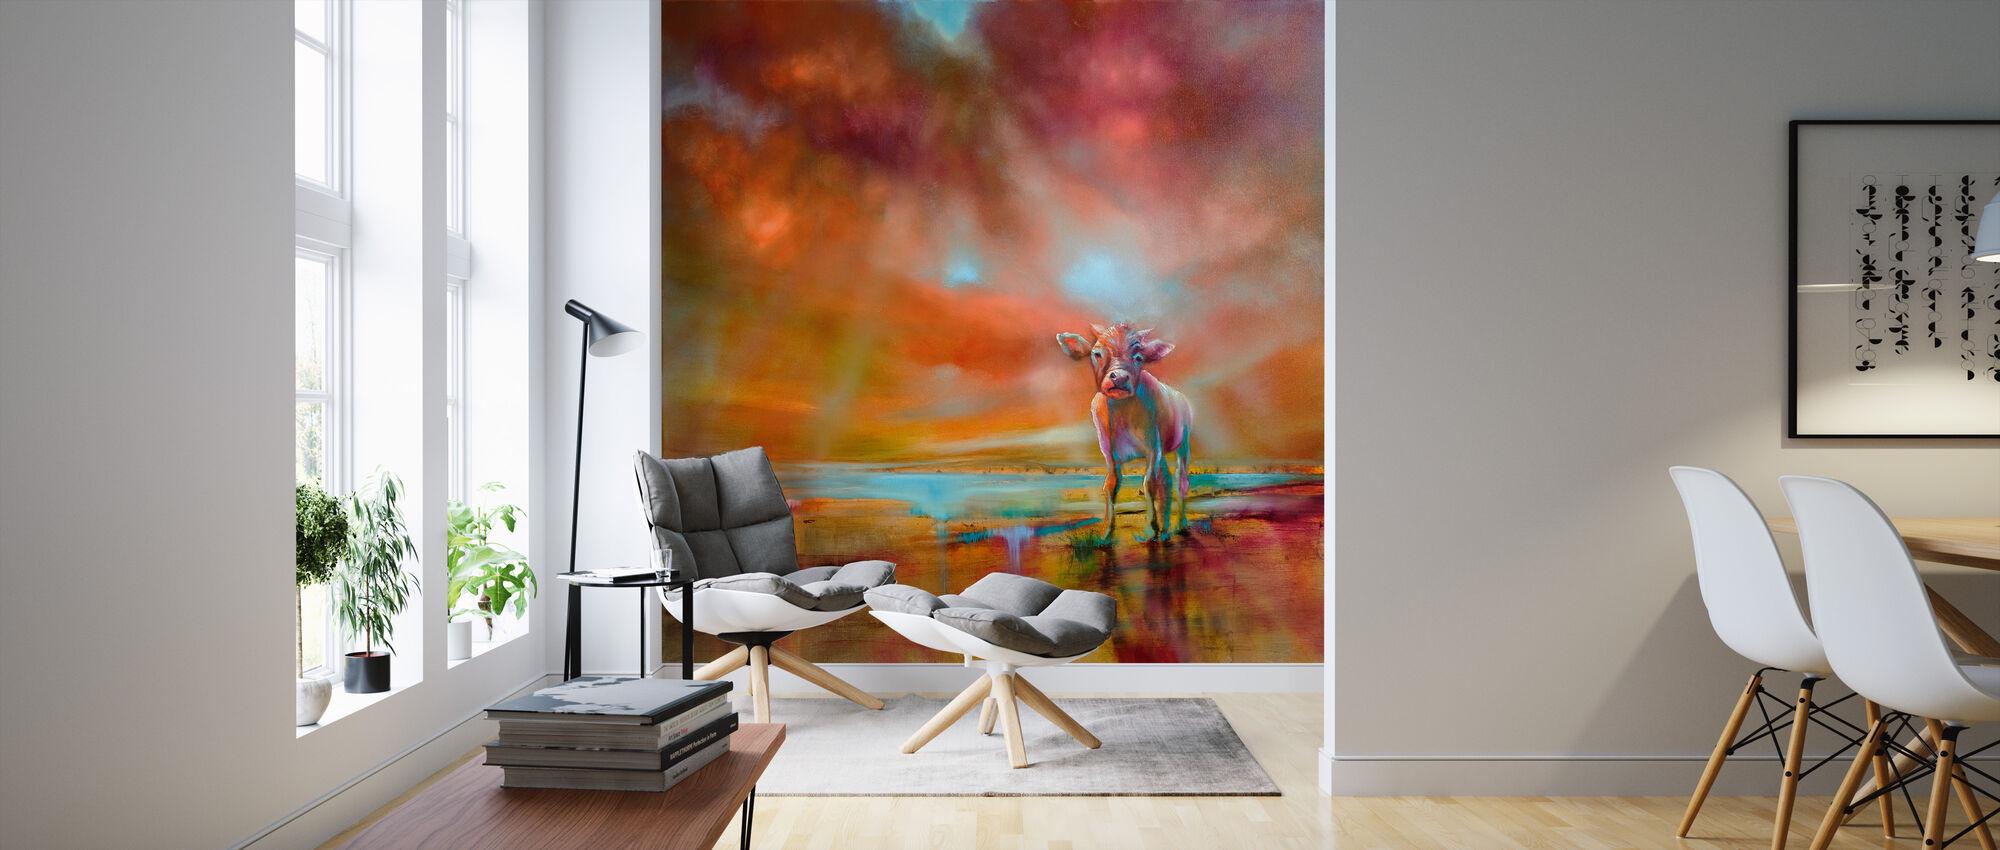 Colorful - Wallpaper - Living Room